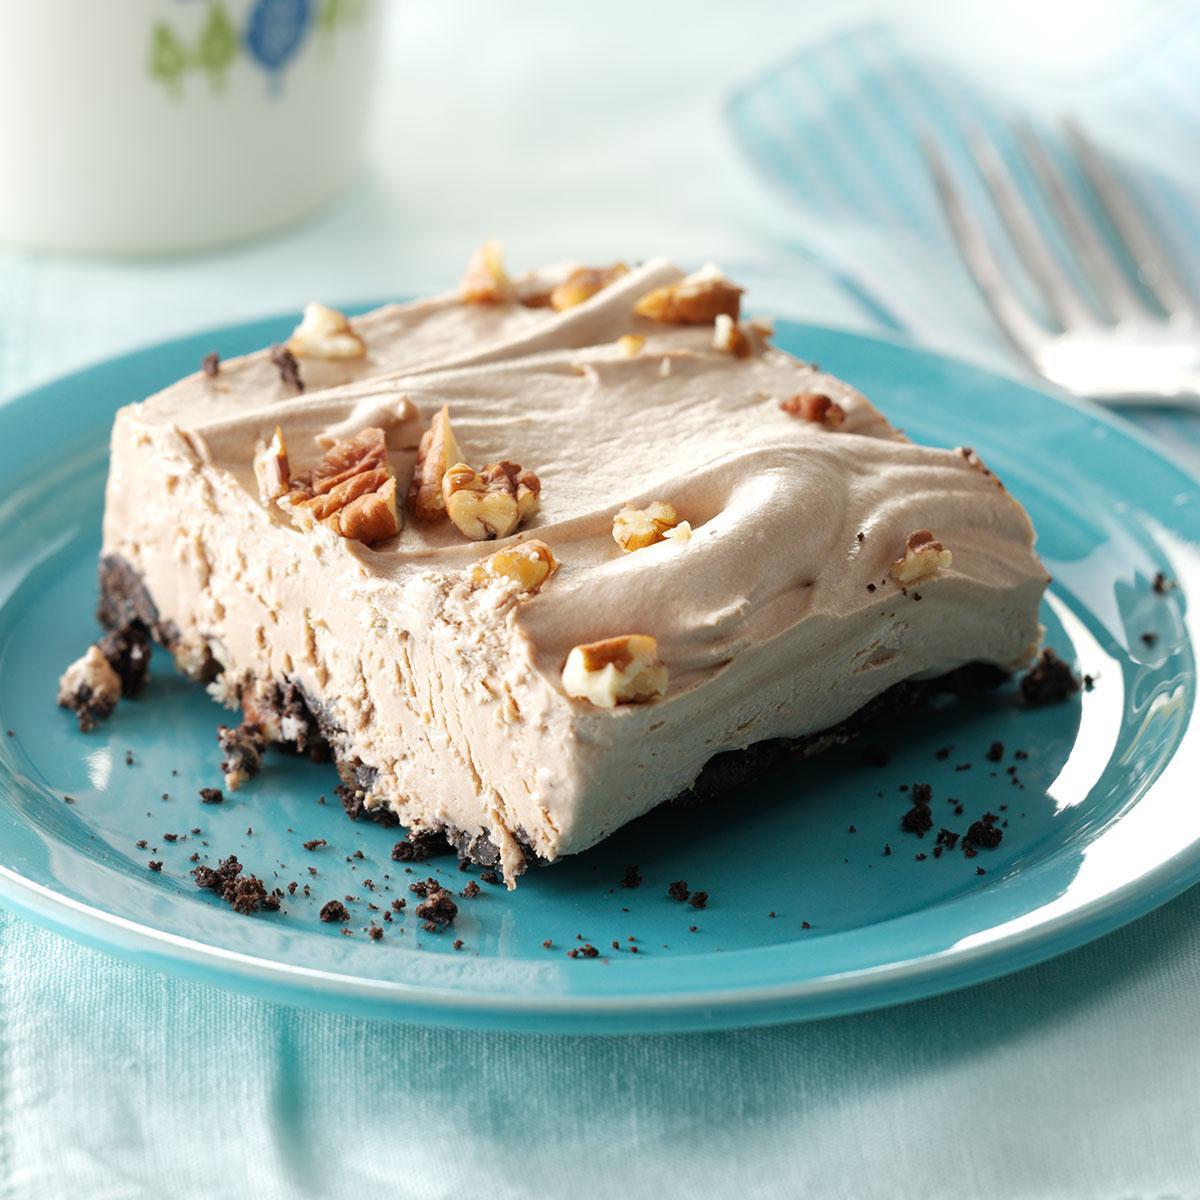 Frozen Dessert Recipies  Creamy Mocha Frozen Dessert Recipe